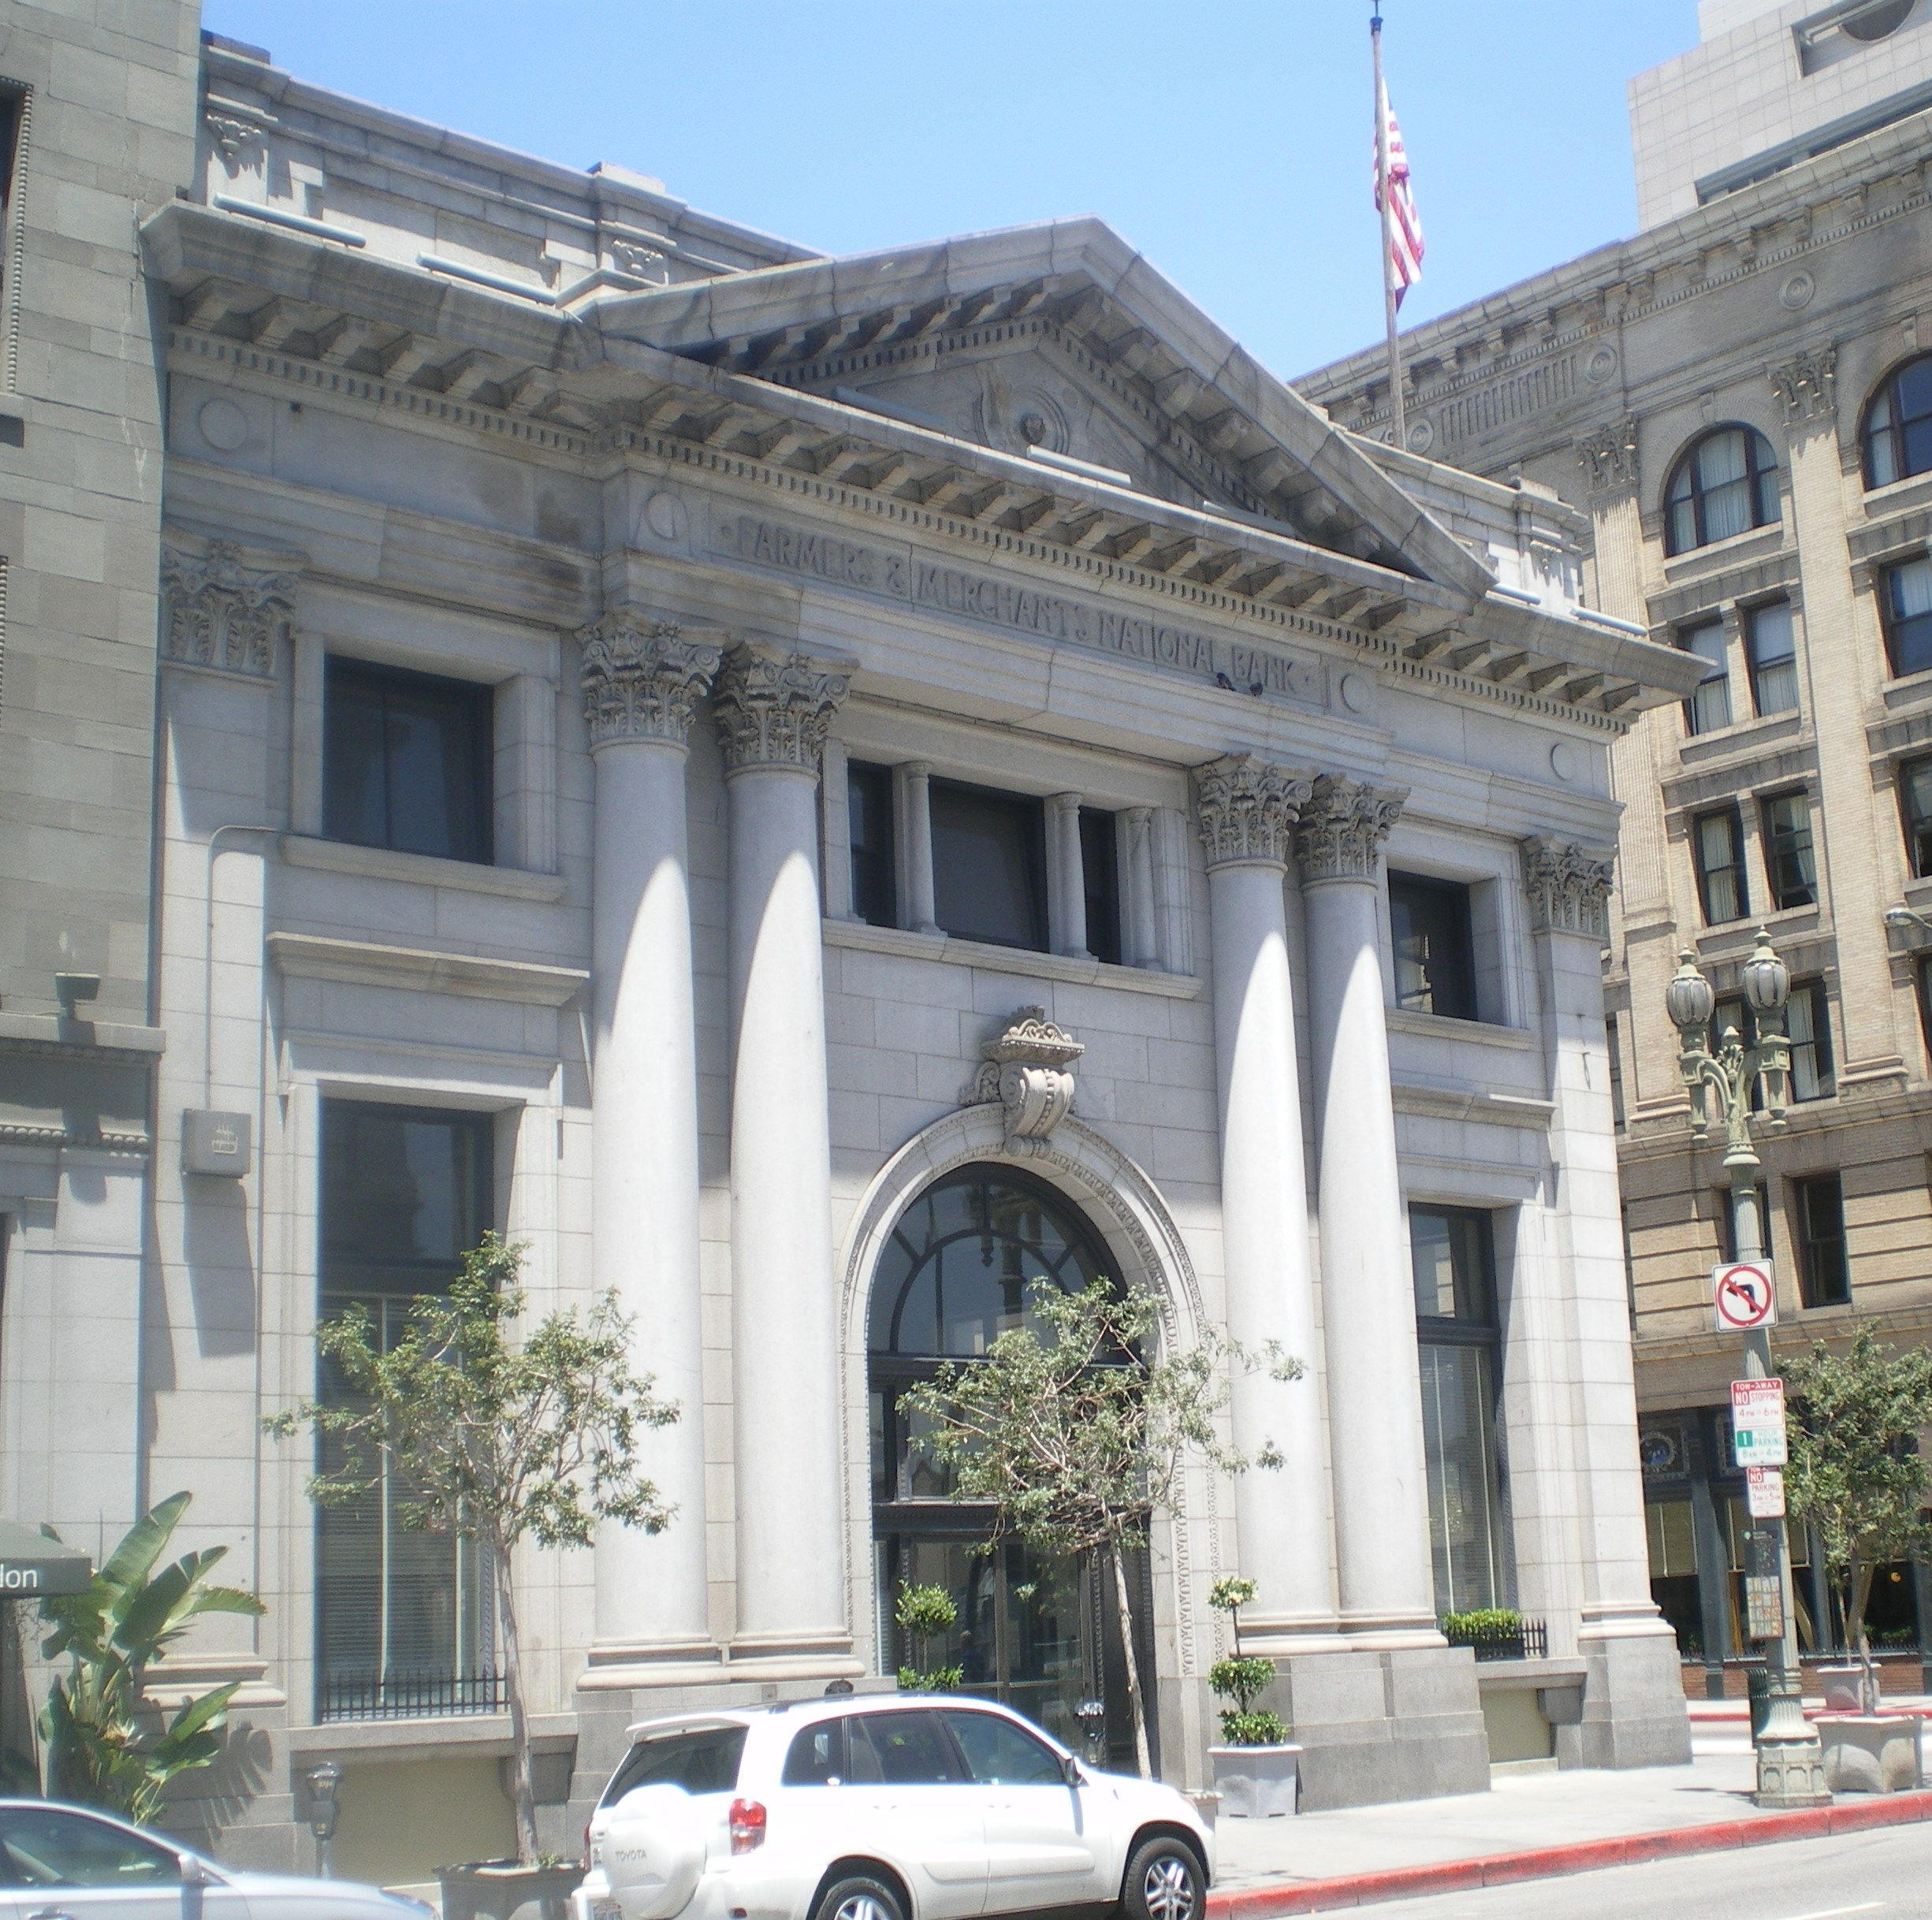 http://upload.wikimedia.org/wikipedia/commons/1/1e/Farmers_&_Merchants_Bank,_Los_Angeles.JPG